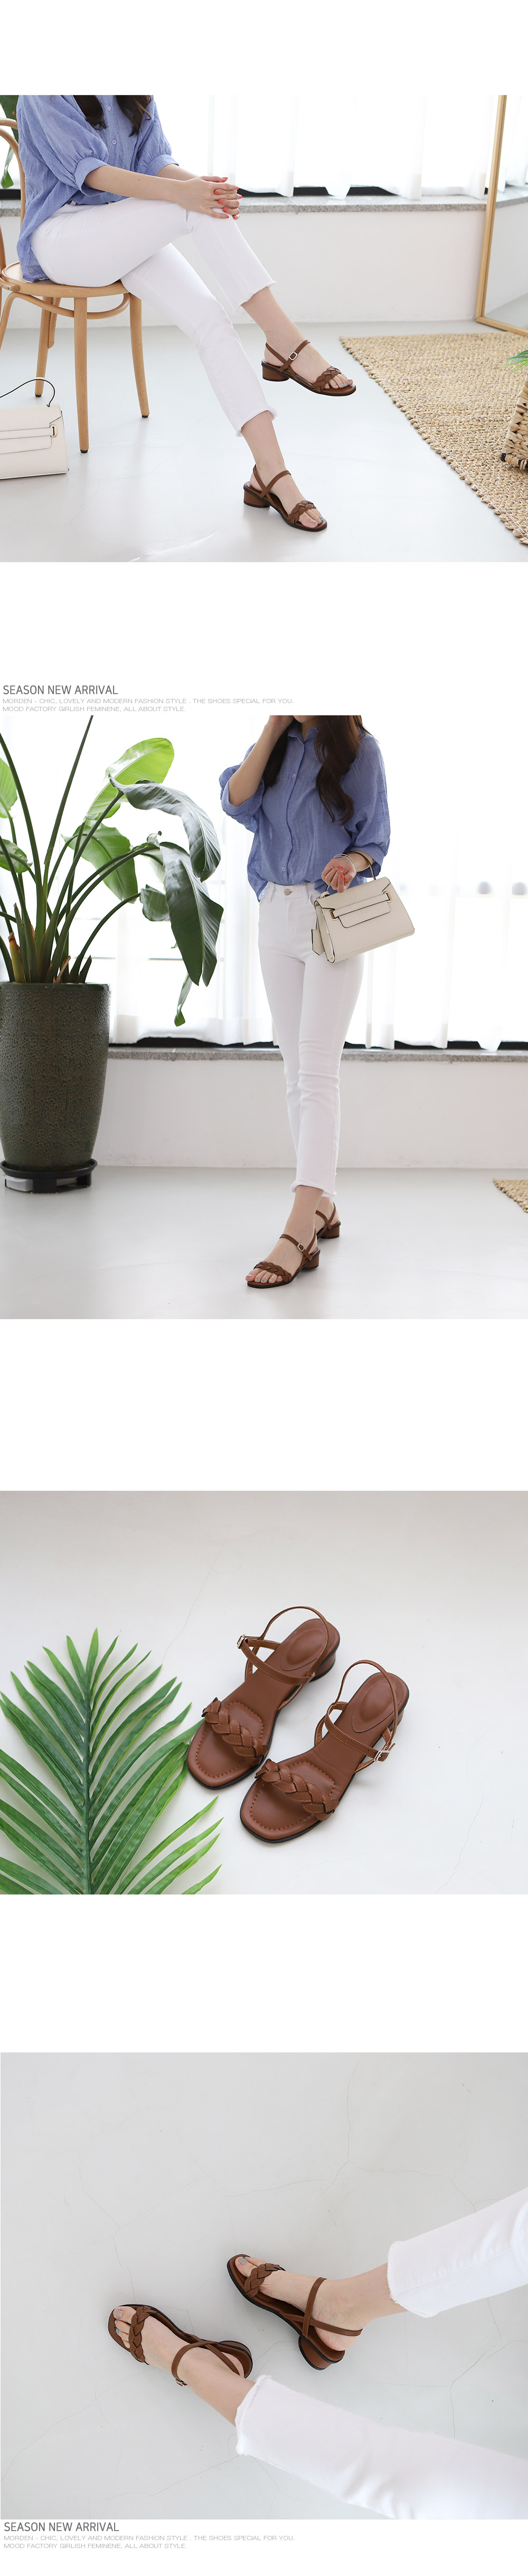 [Handmade] Low Chunky Heel Sandals-holiholic.com